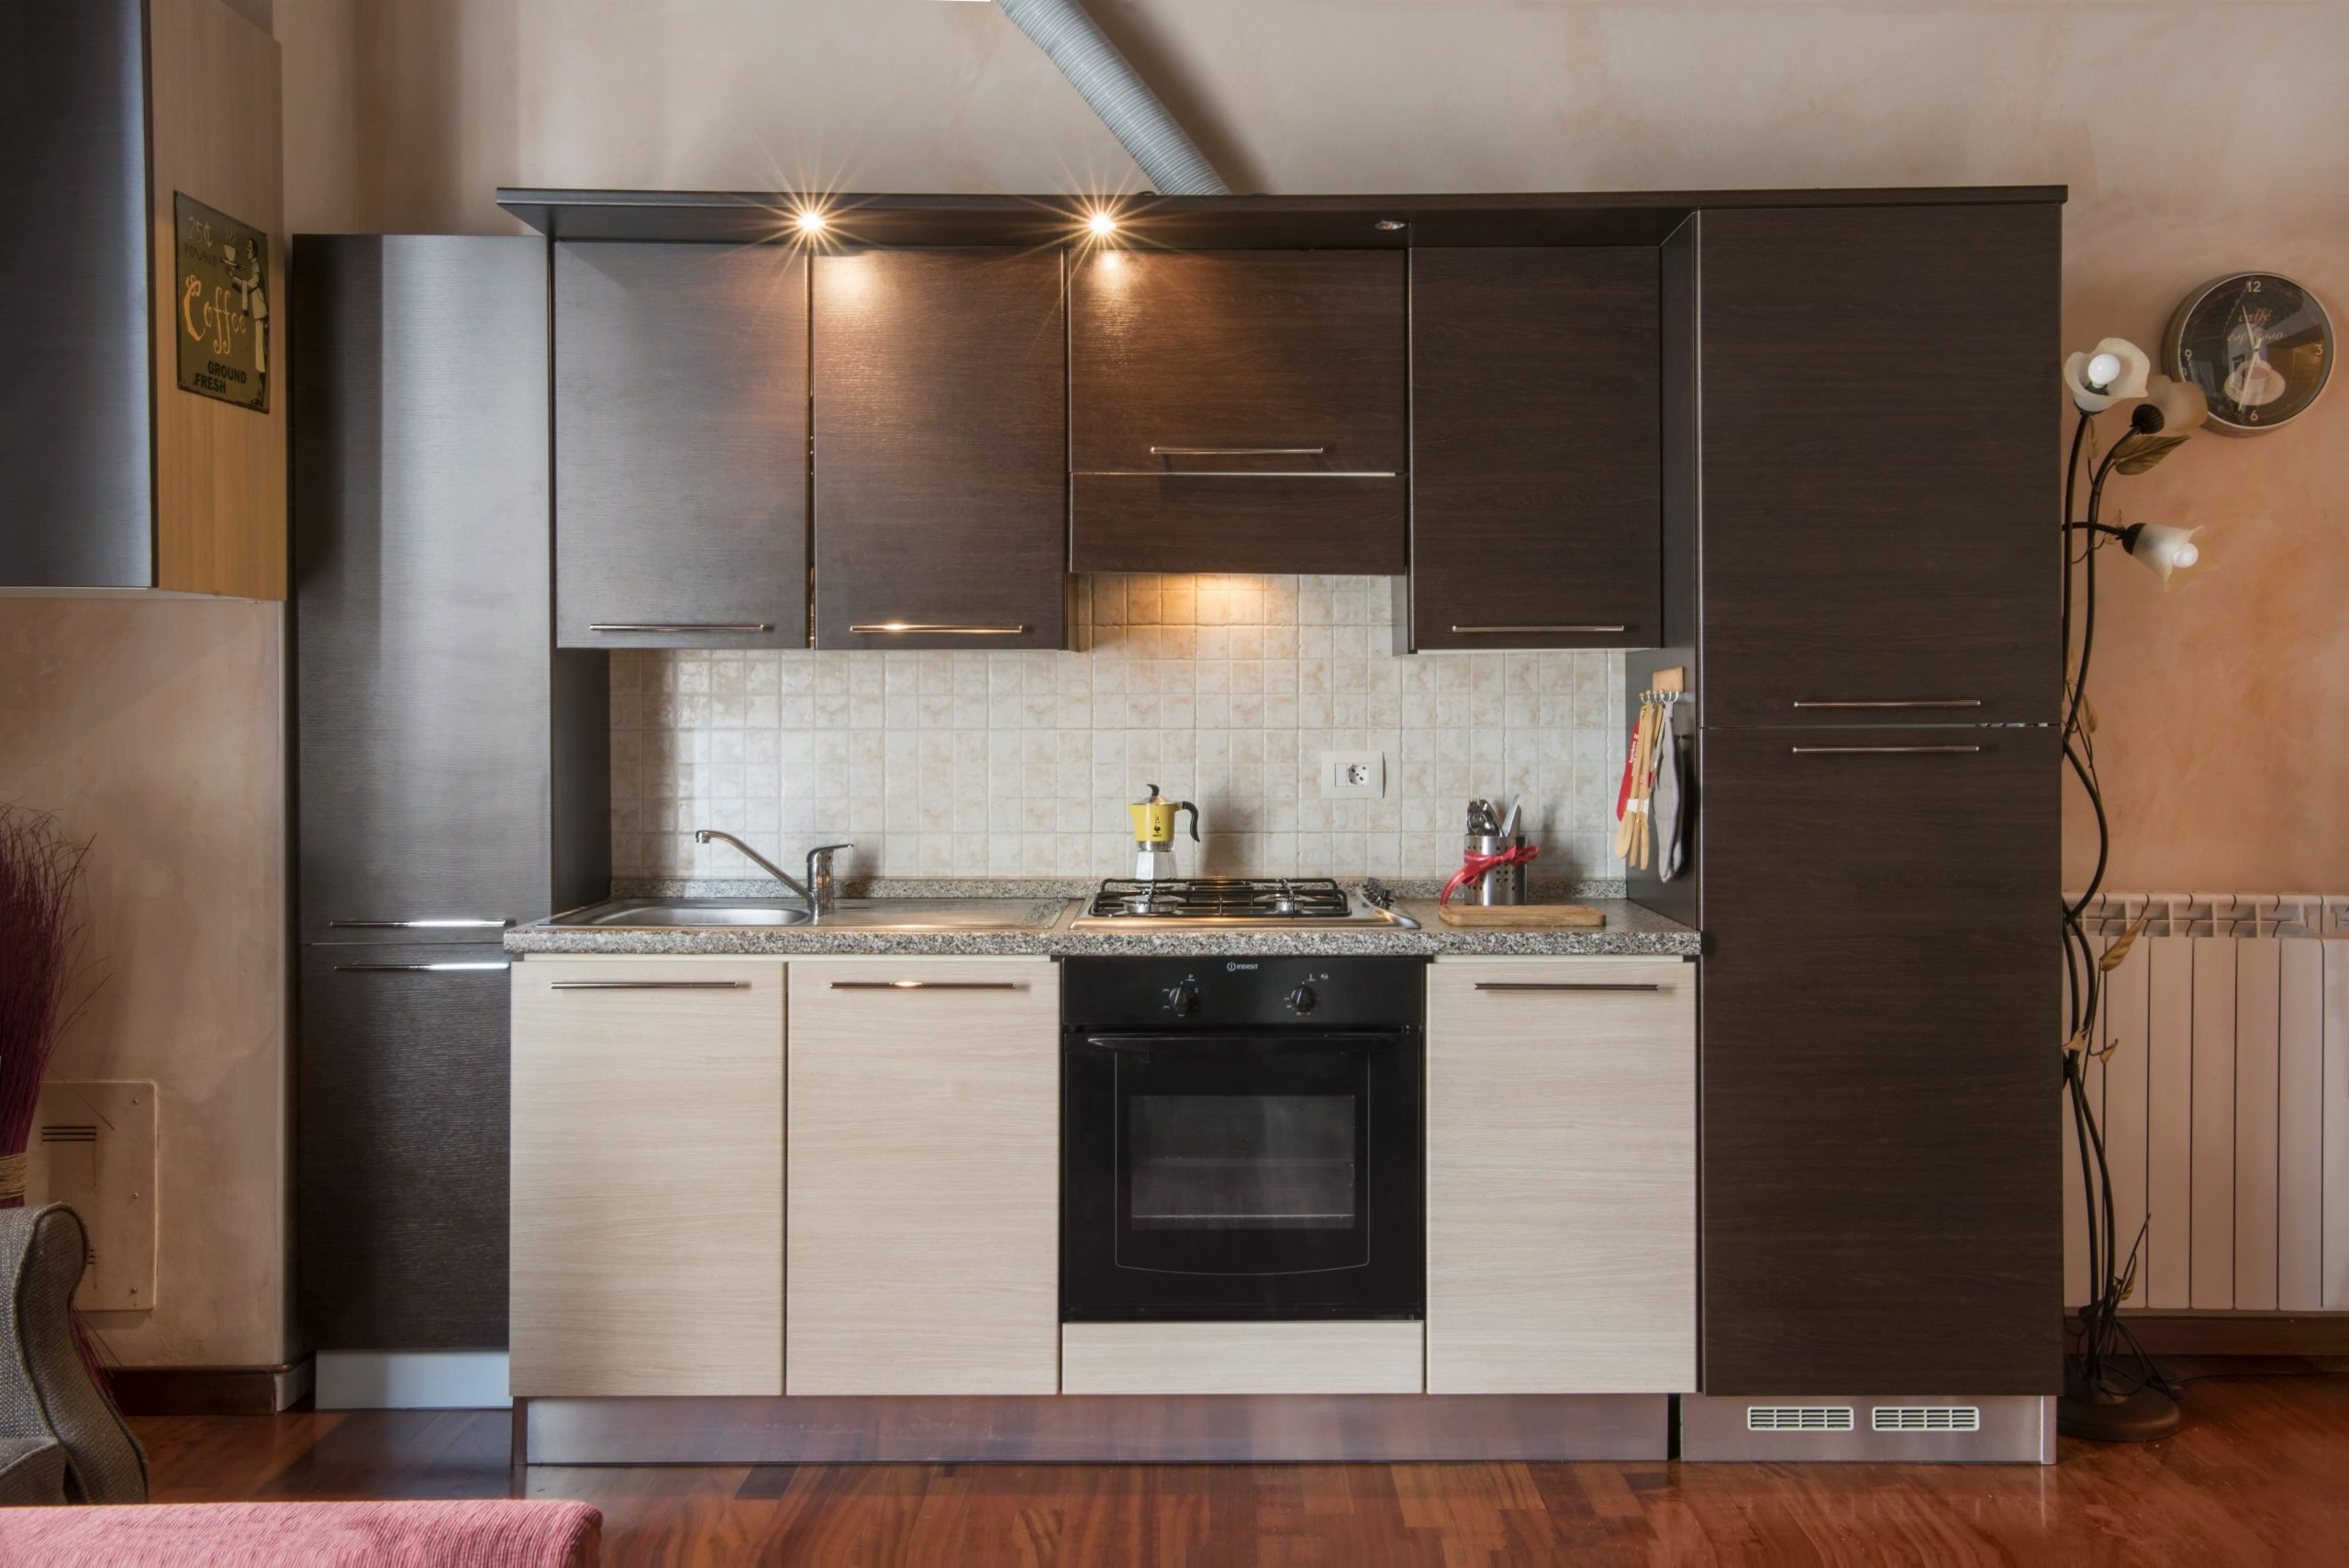 appartamento-orsa-minore-residence-chiaralba-cucina.jpg